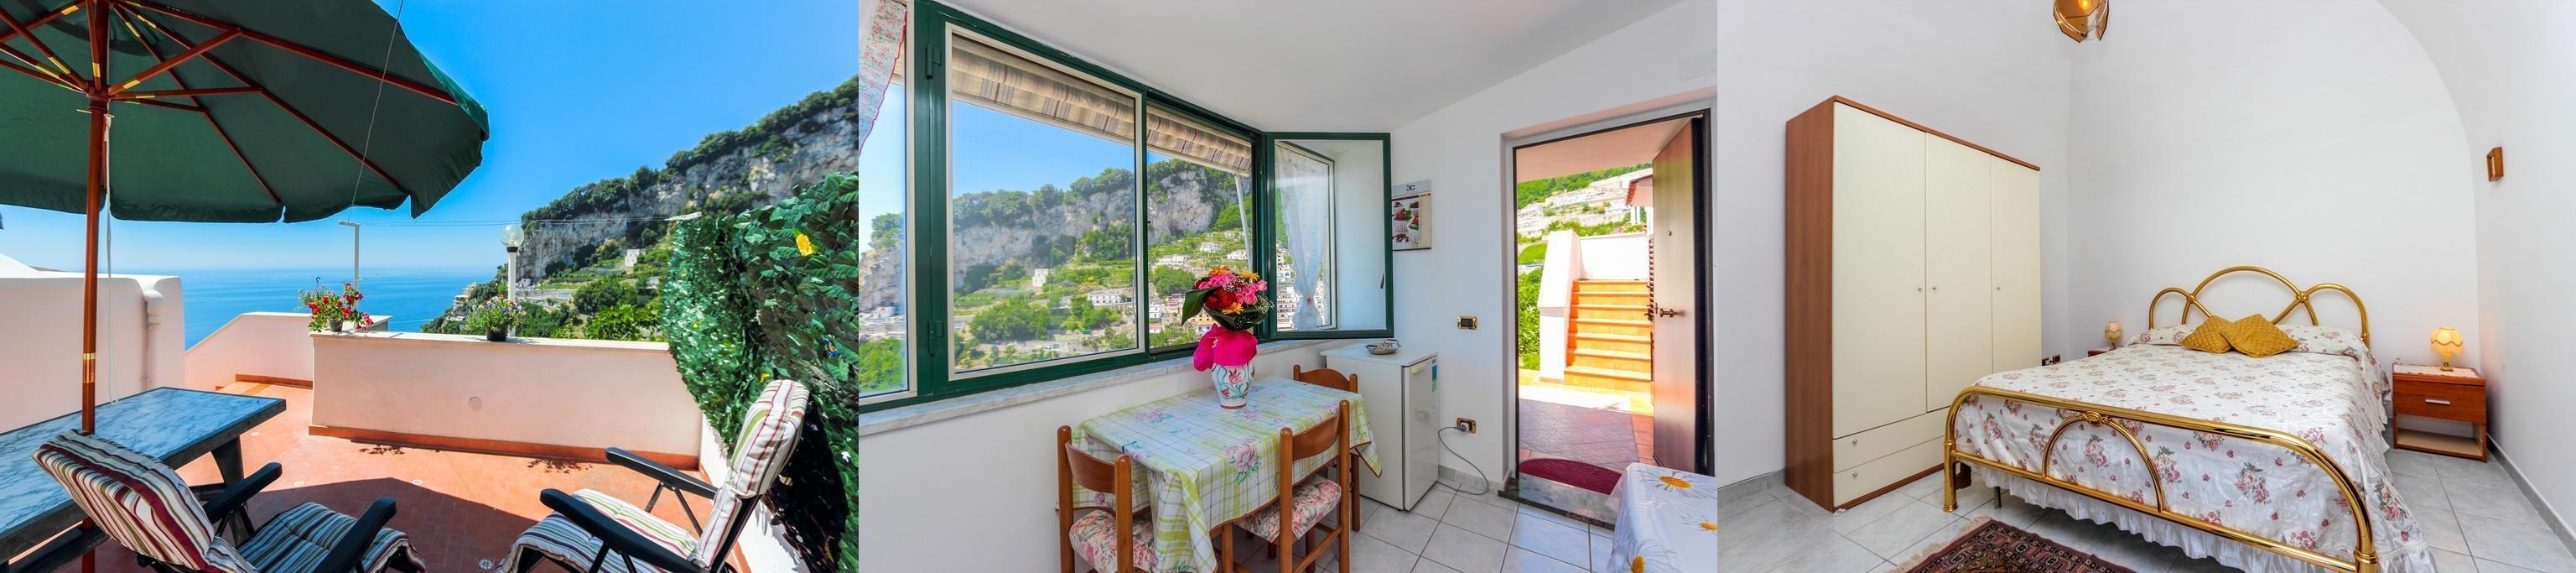 Villa Mare Amalfi